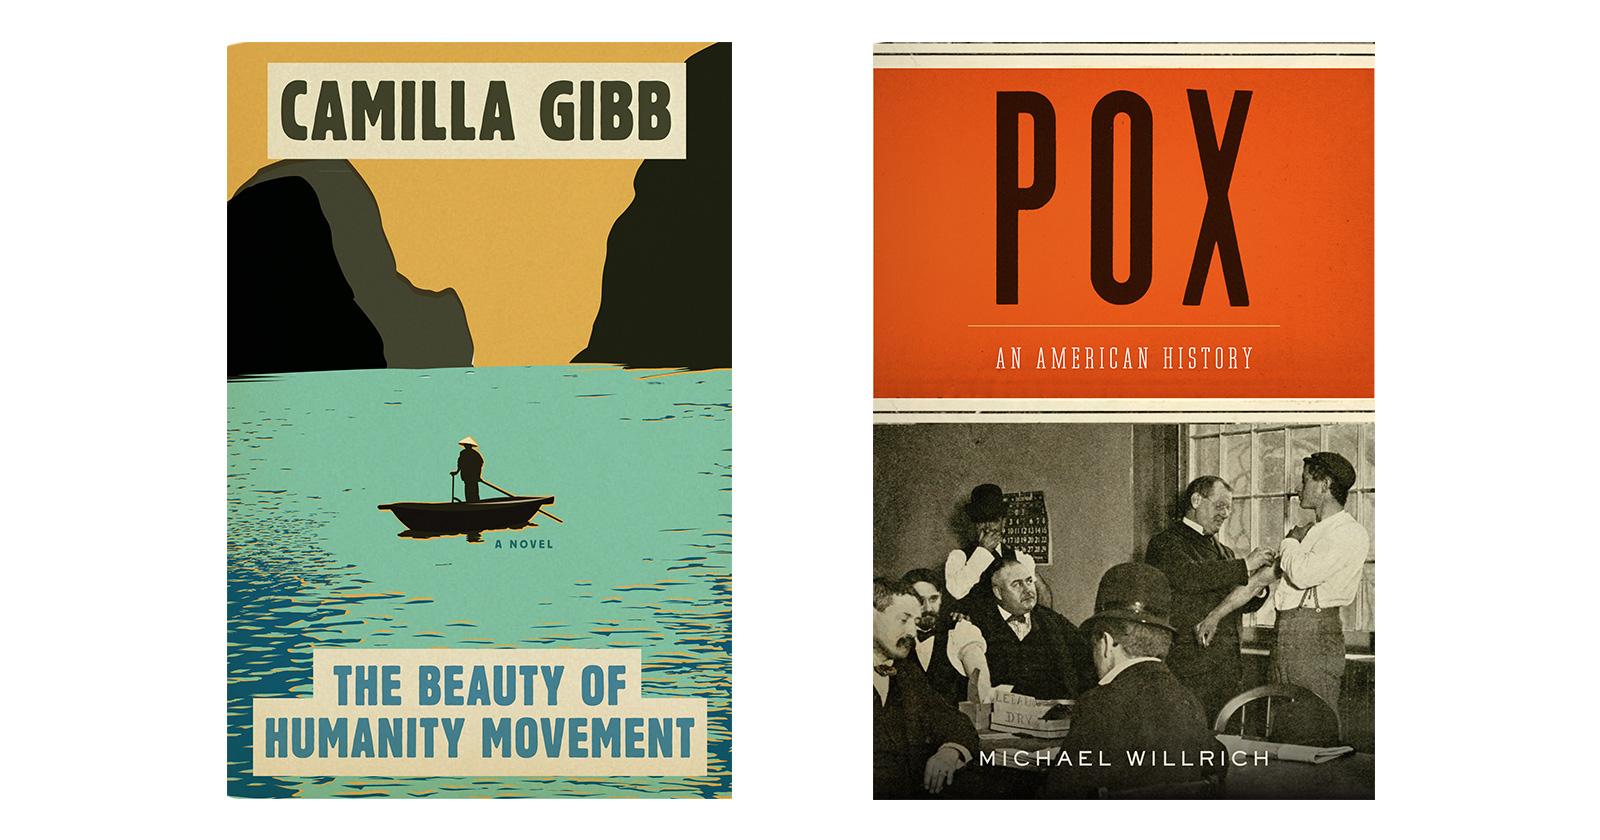 Book-covers-2.jpg